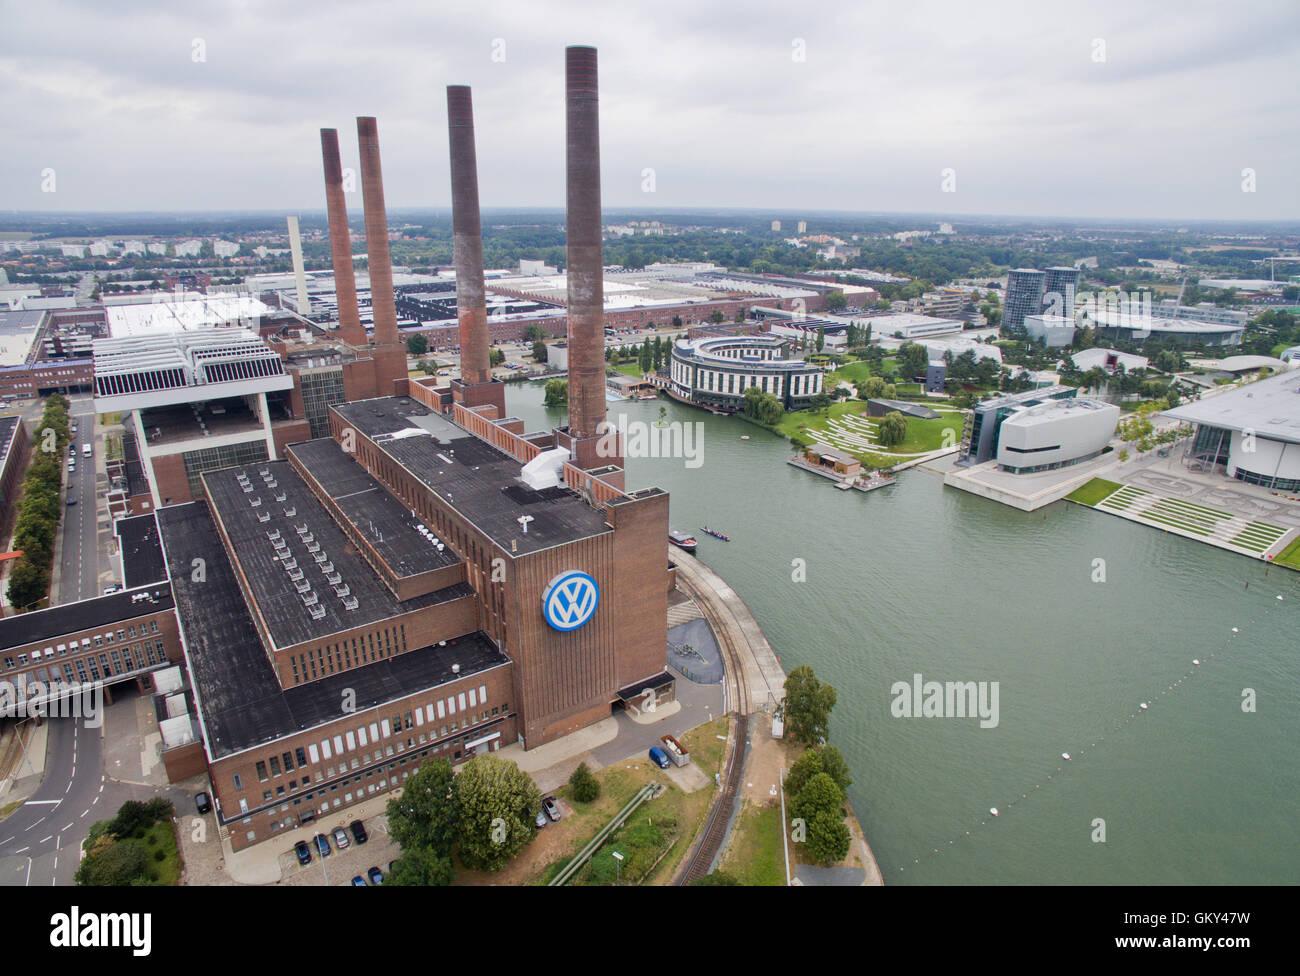 Aerial View Volkswagen Car Factory Imágenes De Stock & Aerial View ...